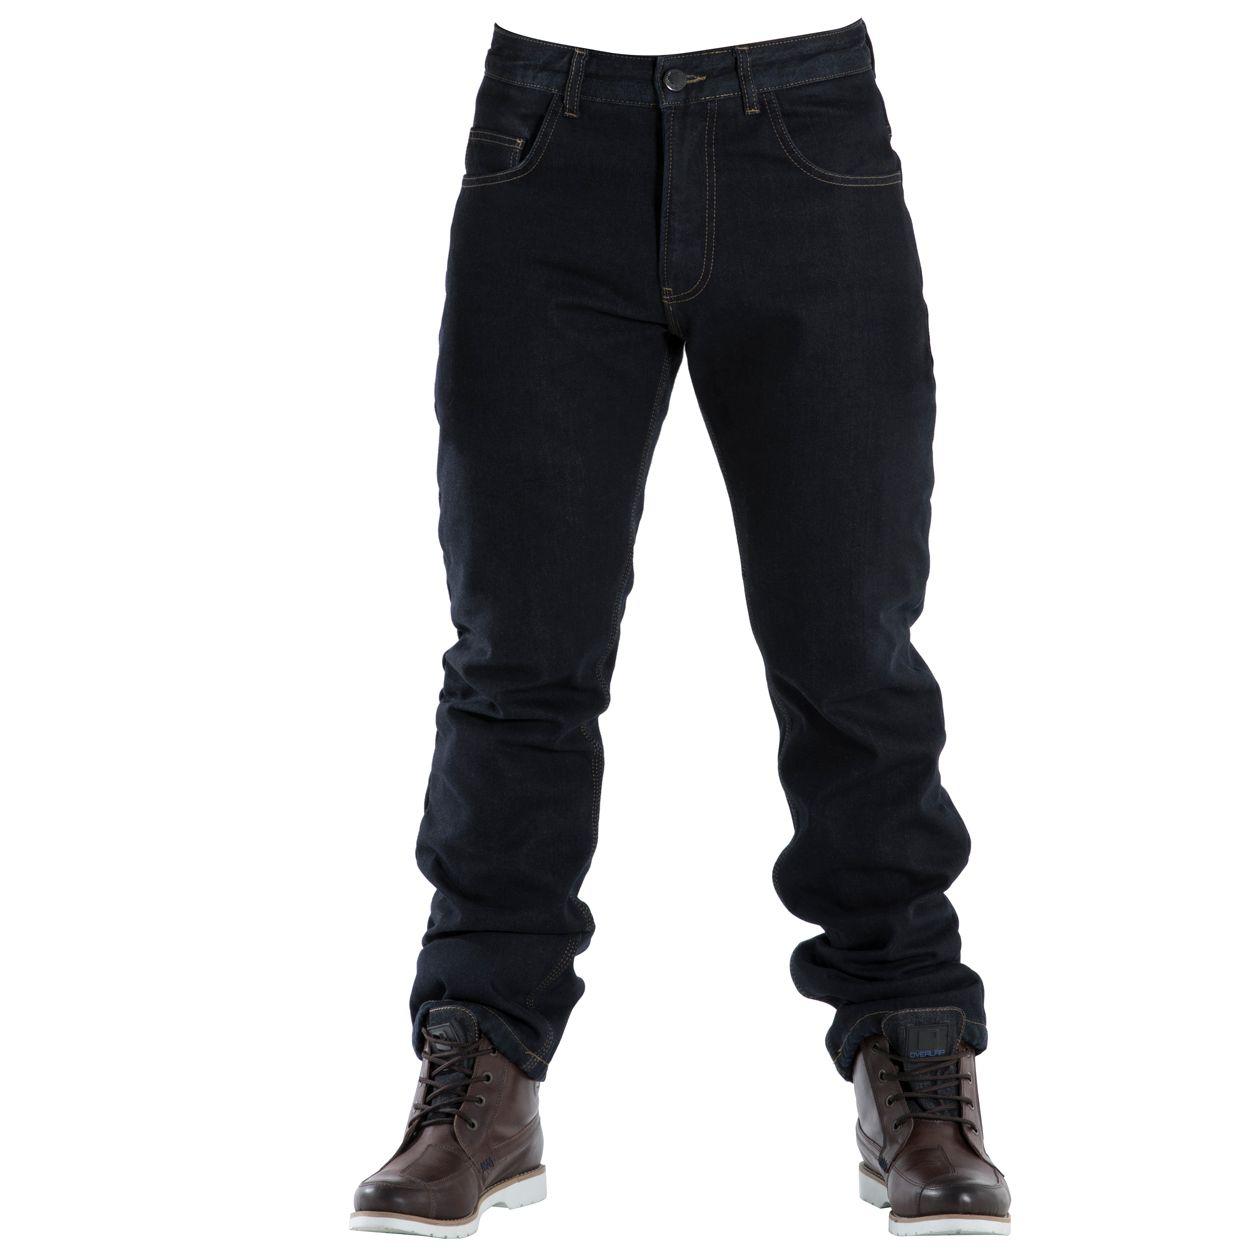 Raw Jean Overlap Moto Manx Pantalon qpzMUVS